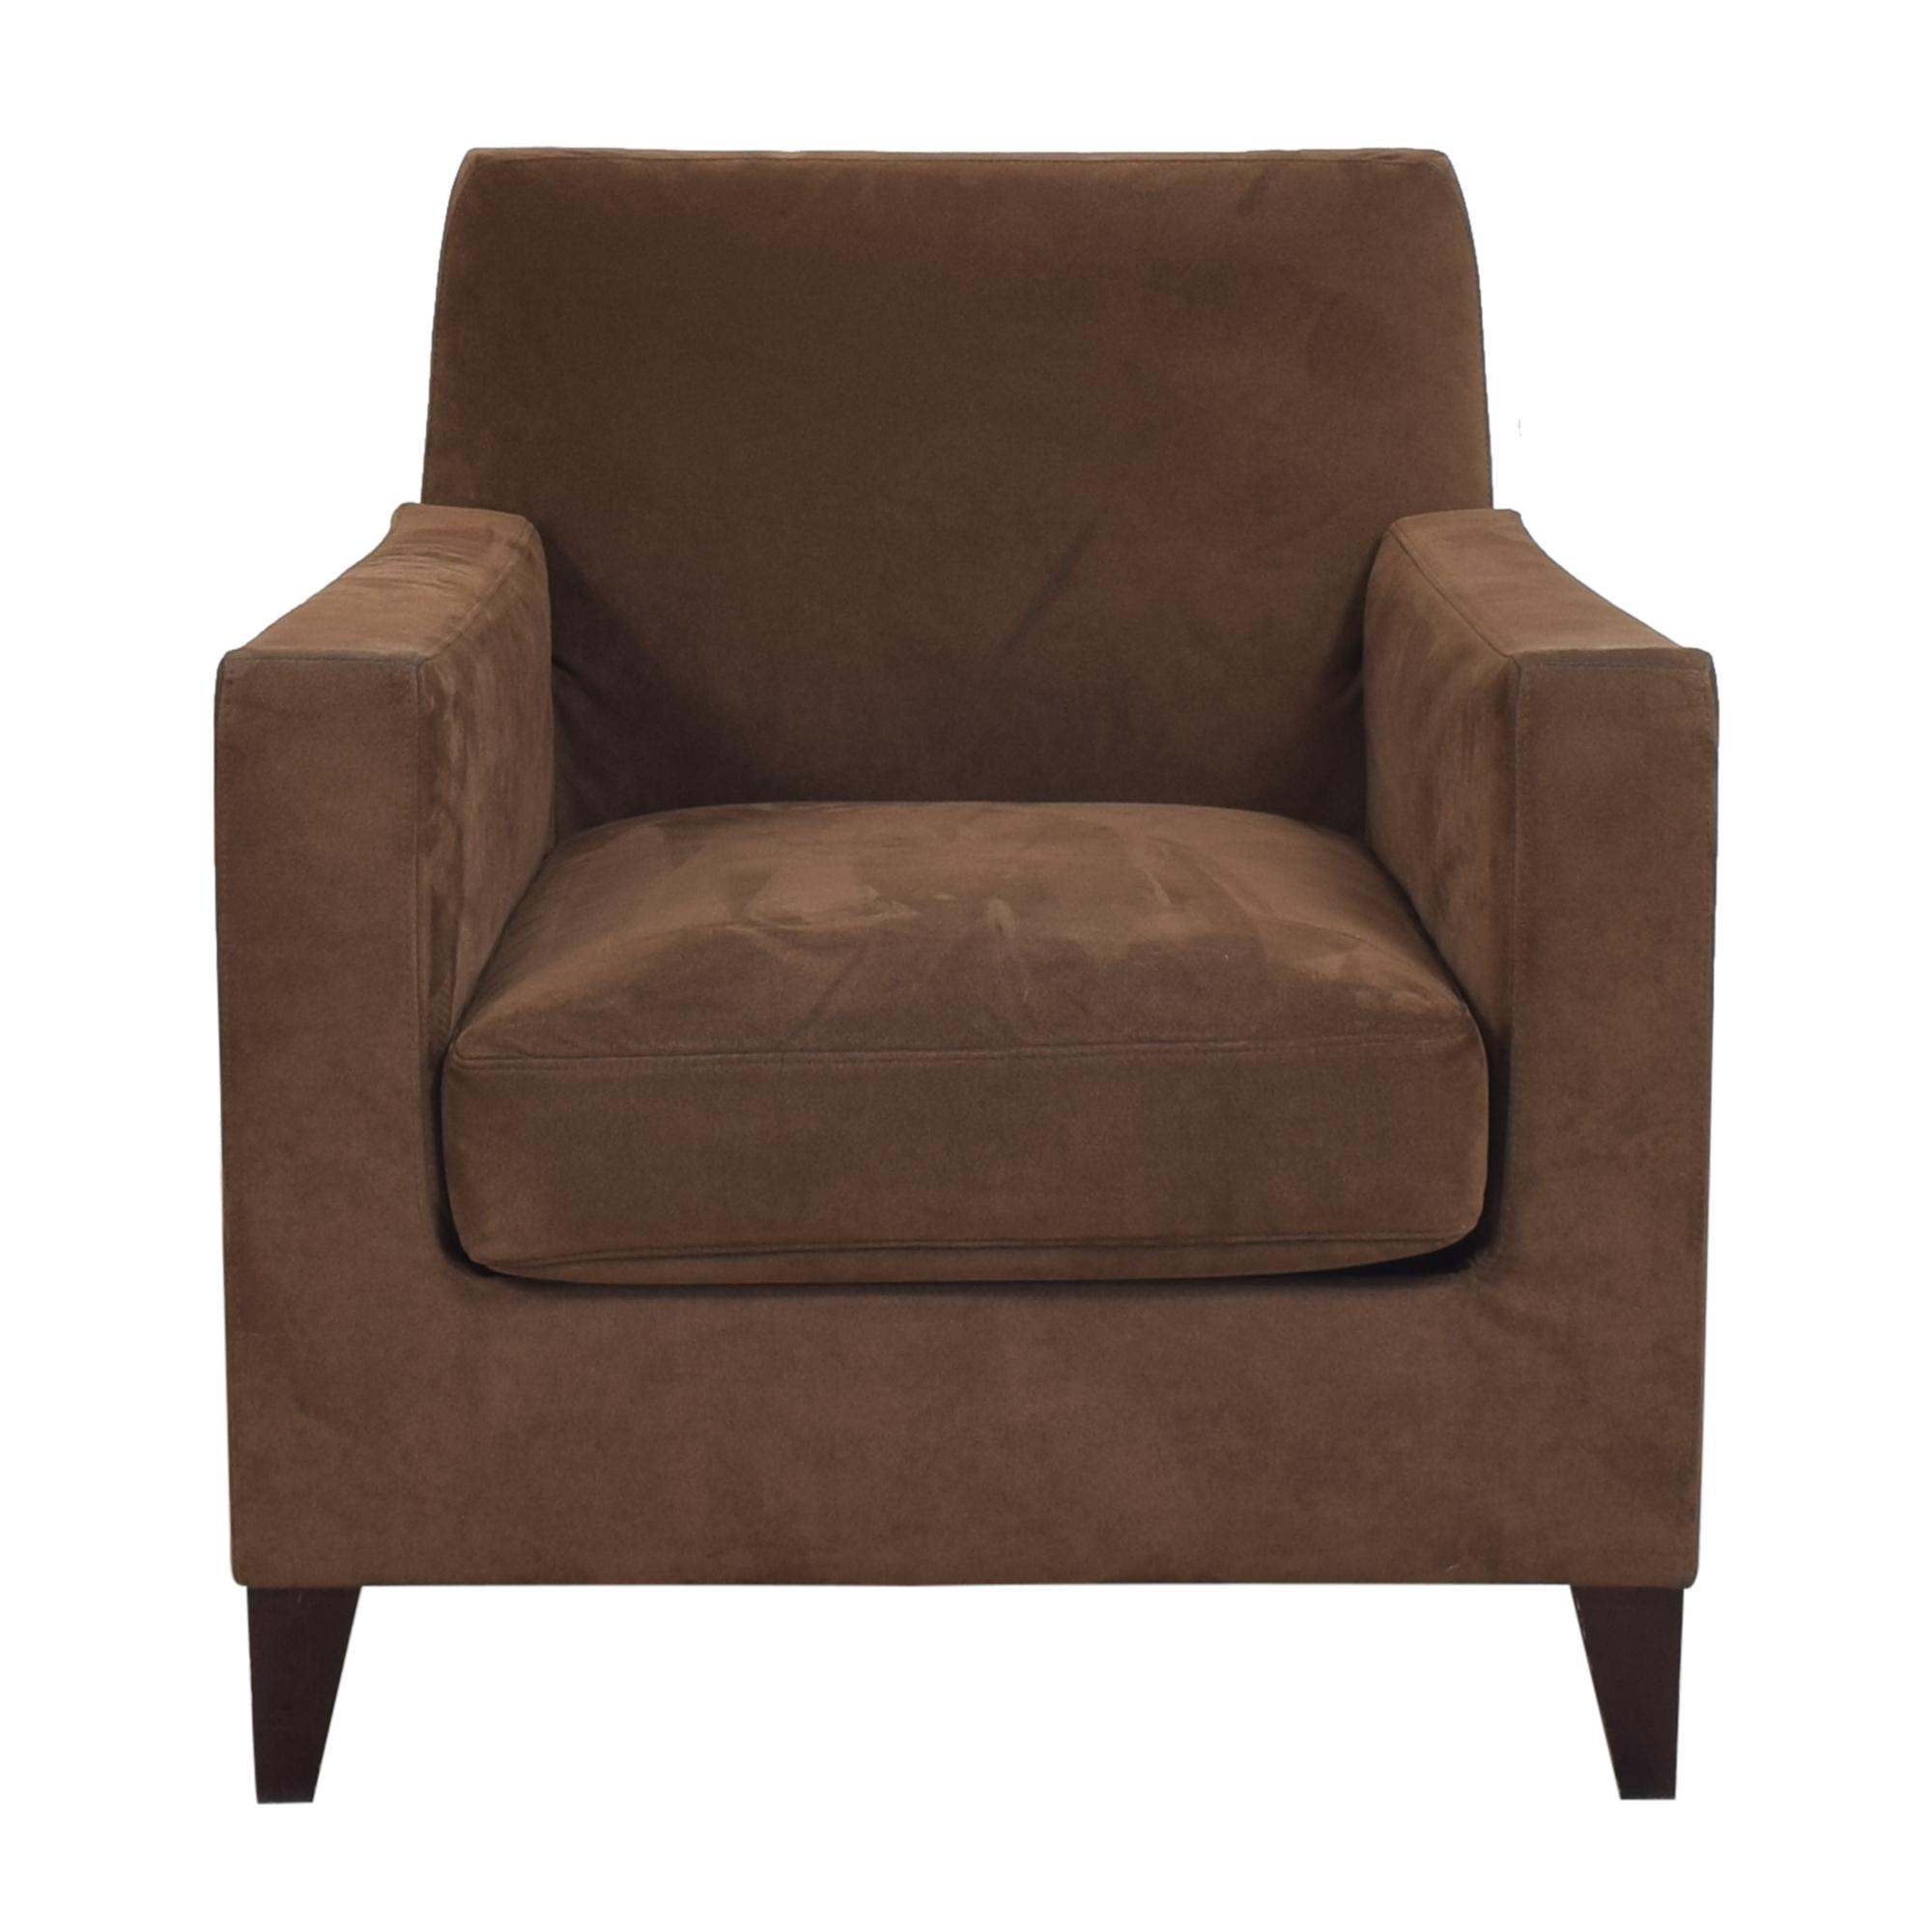 Ligne Roset Ligne Roset Modern Accent Chair nyc